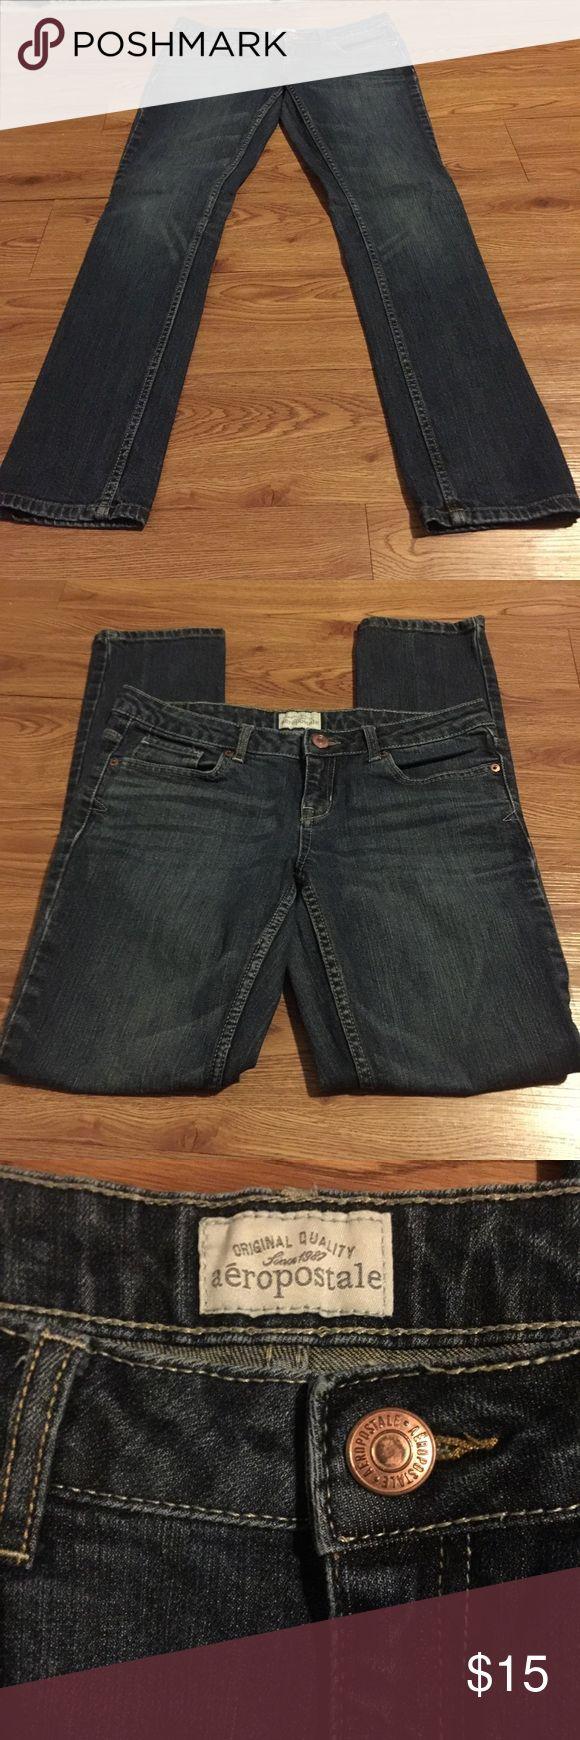 Aeropostale Bayla skinny 5/6 Reg jeans Aeropostale Bayla skinny 5/6 Reg jeans Aeropostale Jeans Skinny